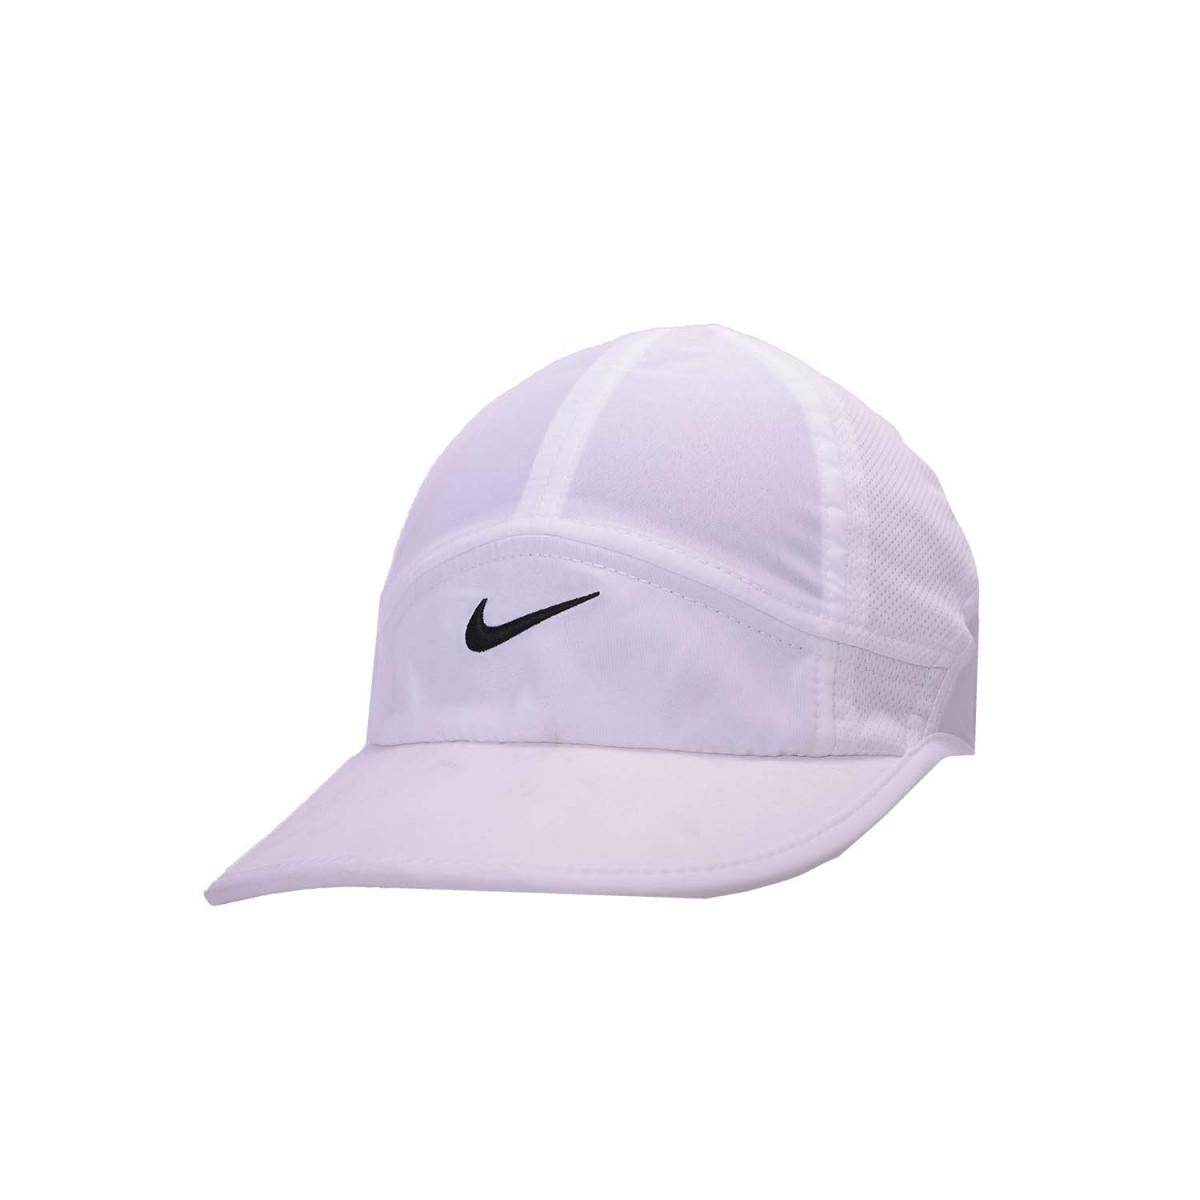 Gorra Nike Feather Light 2.0 - Caps - Gorros - Accesorios - Mujer 40f2a563a42